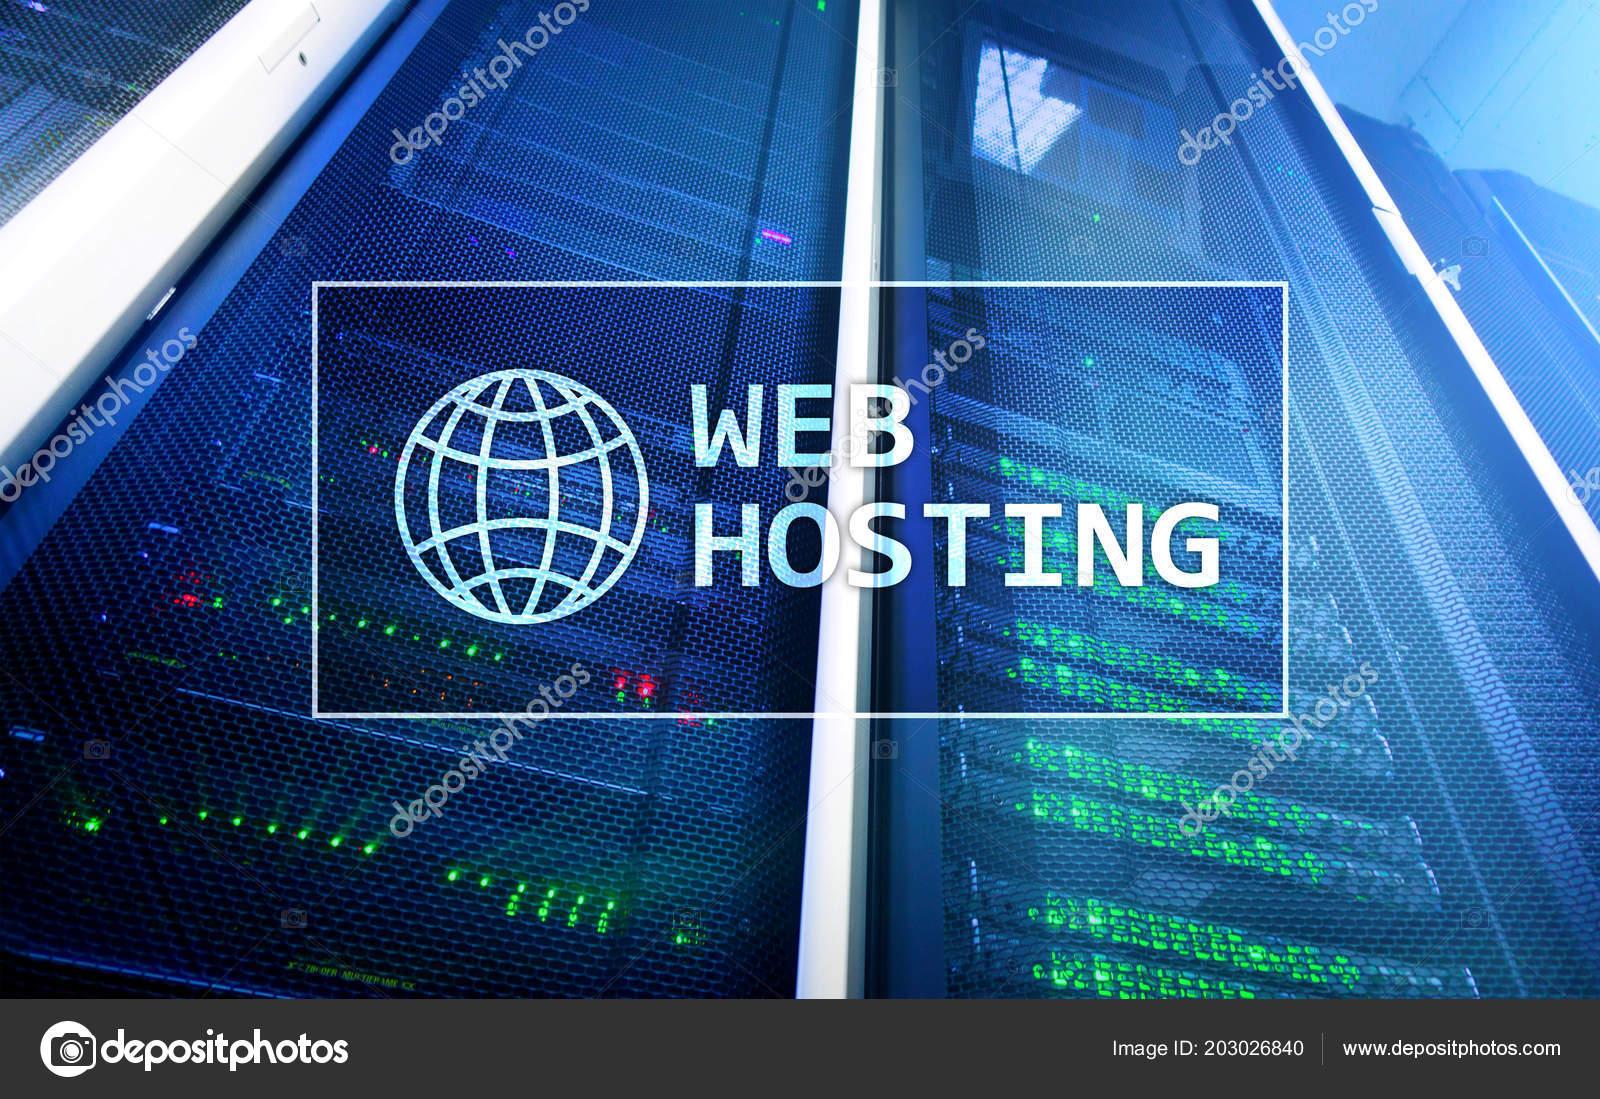 Хостинг доступ к сайту хостинг oracle database